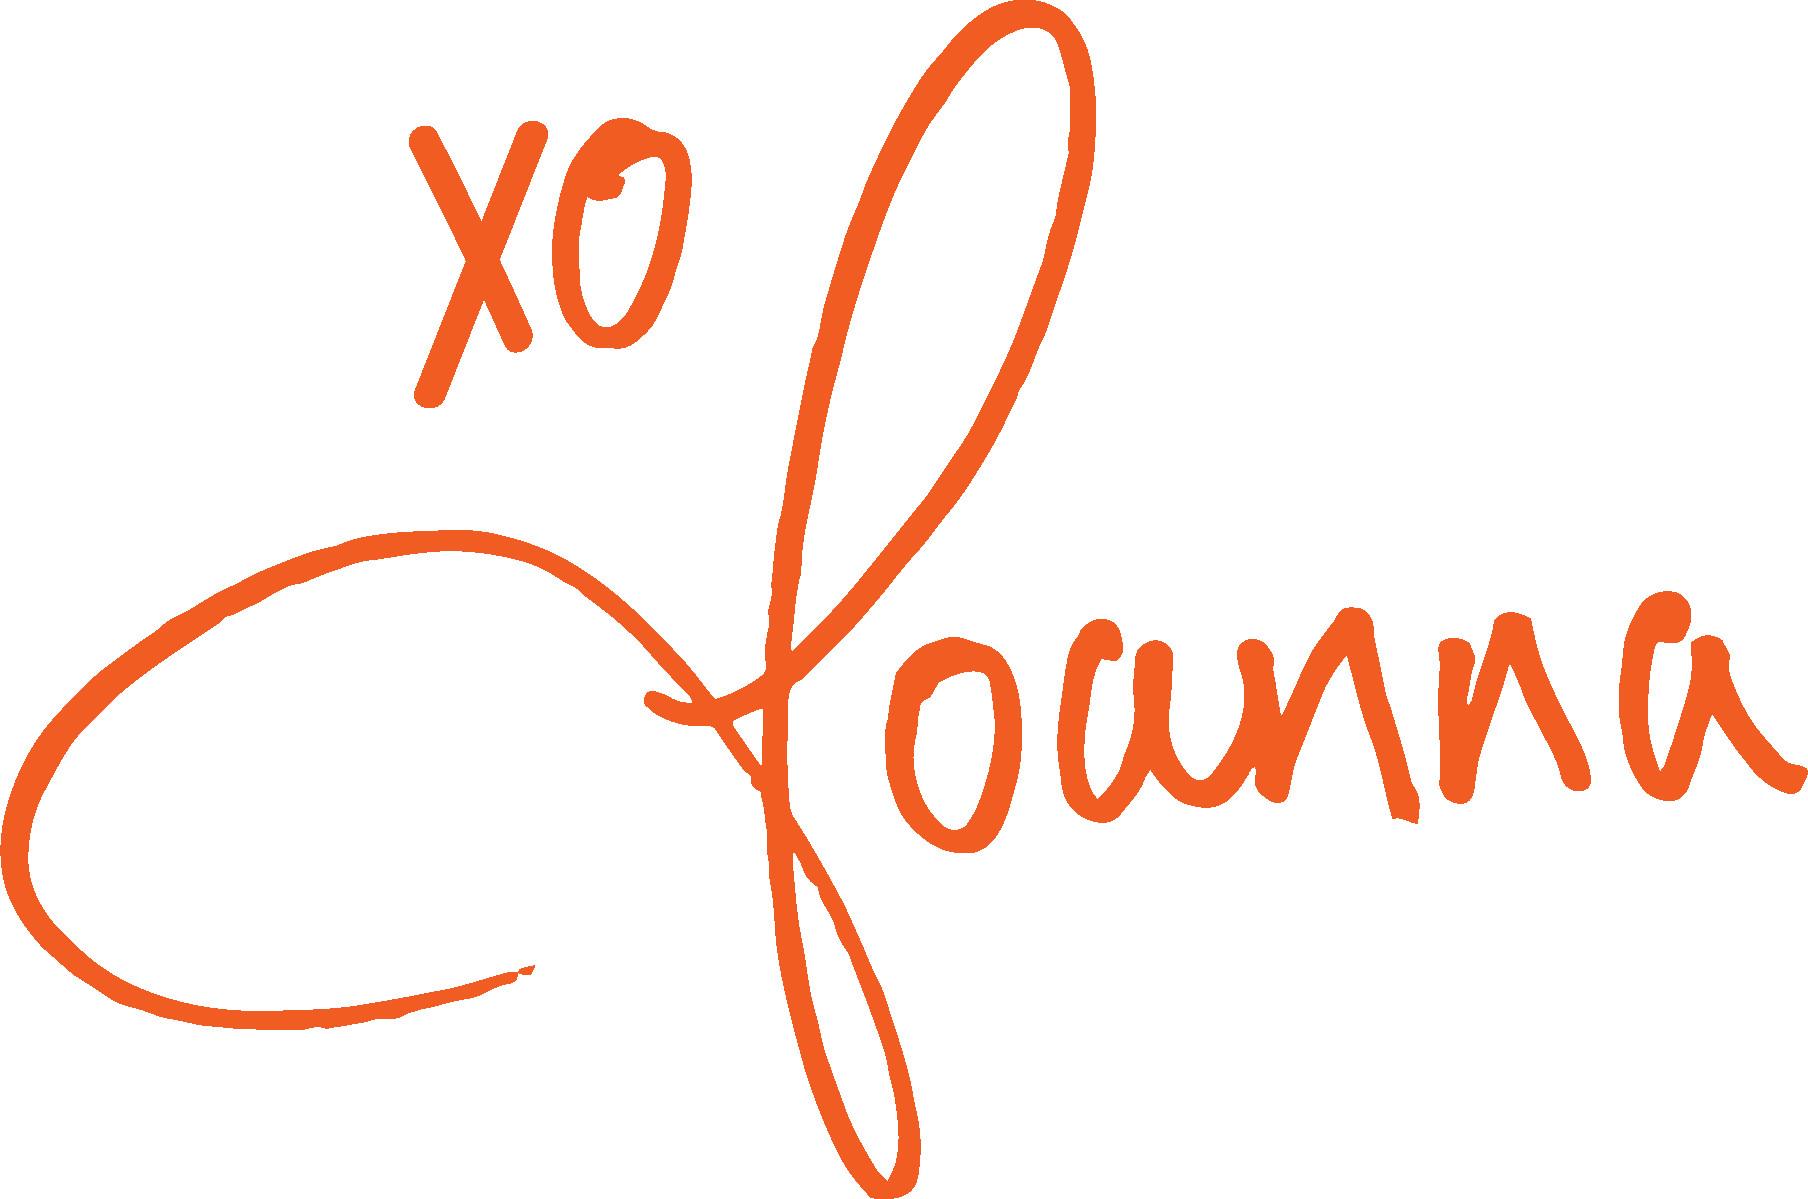 Xo Joanna - orange.jpeg